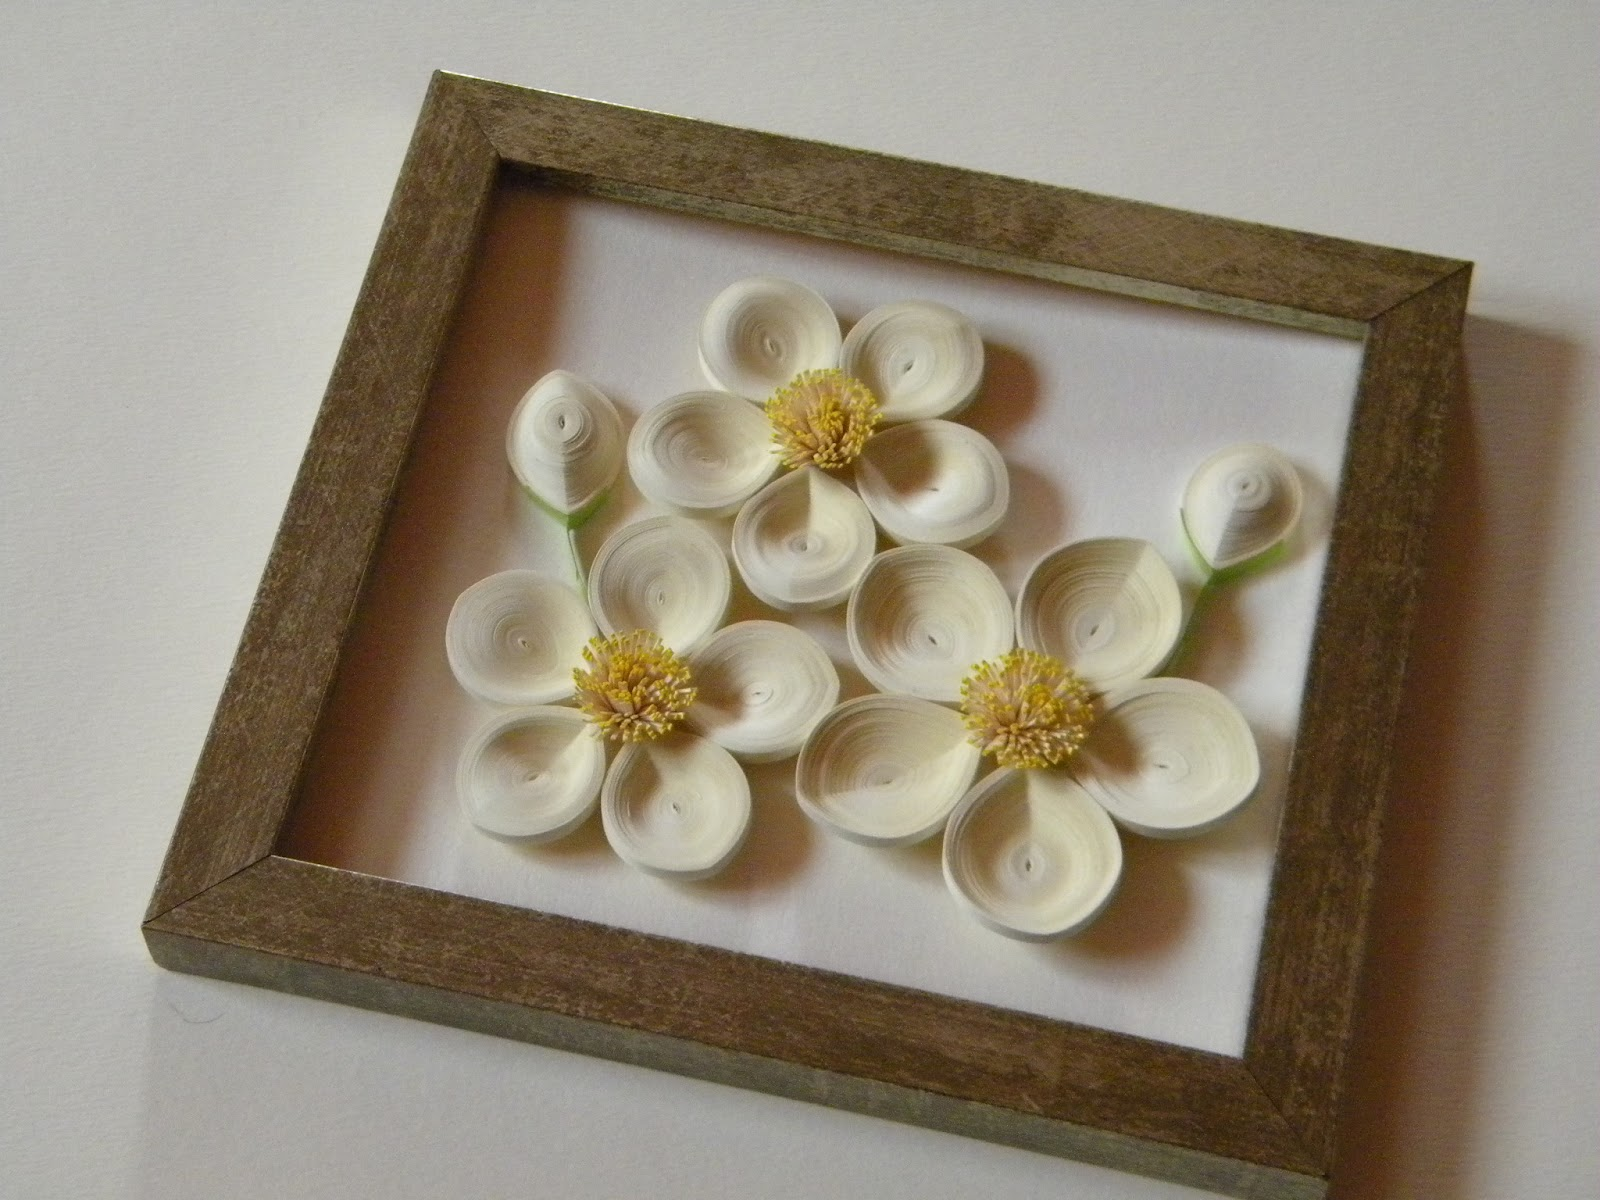 Invita ii de nunt personalizate quilling framed flowers for Decorazioni fai da te casa